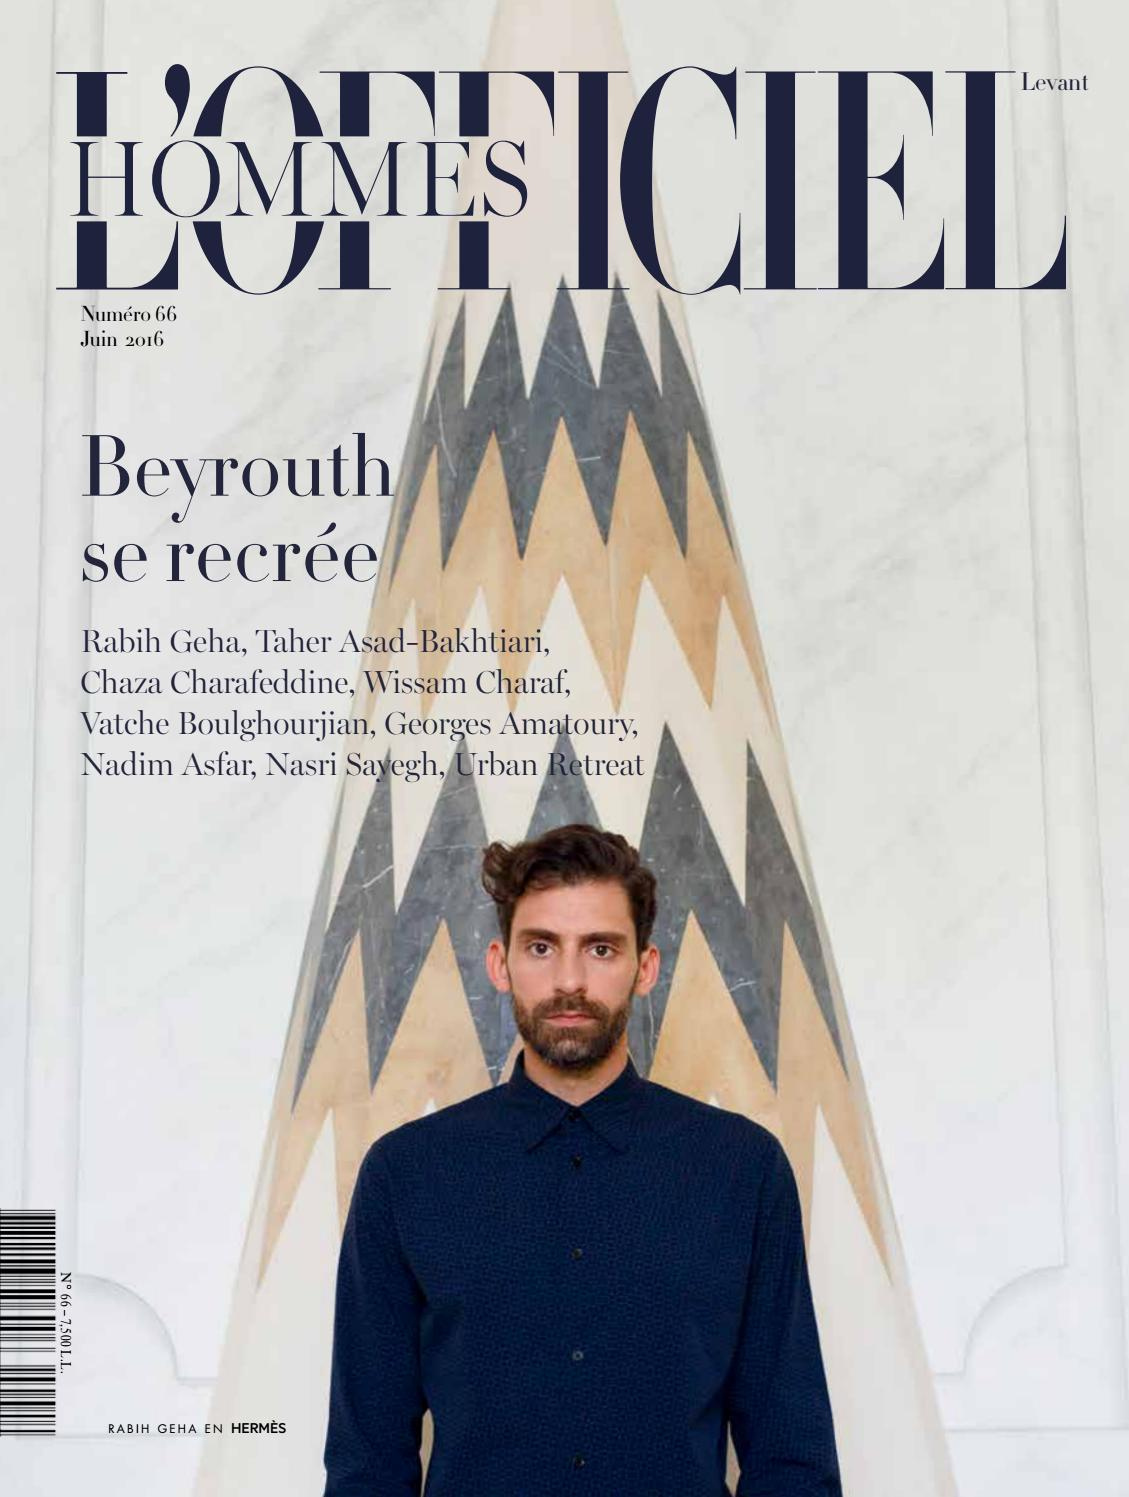 Hommes LevantJune L'officiel 66 Issue Yygf76b